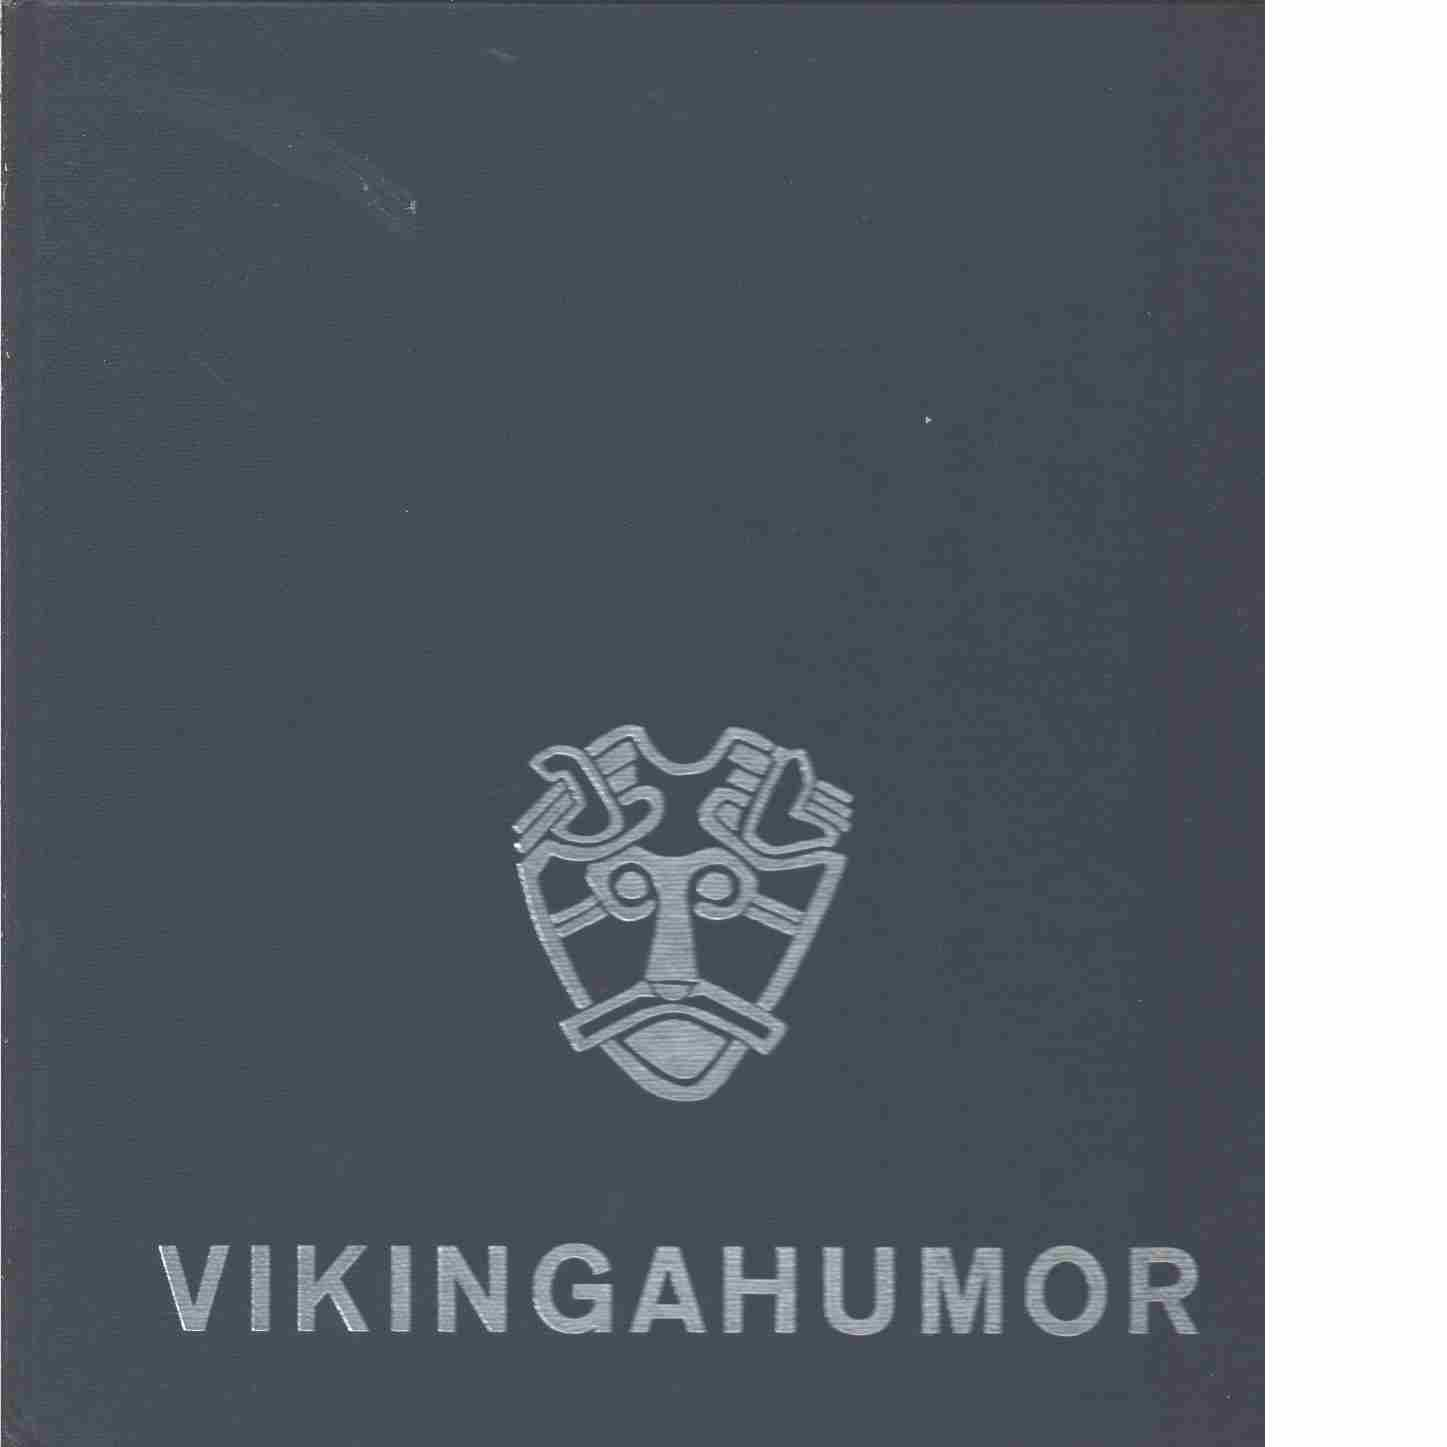 Vikingahumor : berättelser - Red. Ohlmarks, Åke